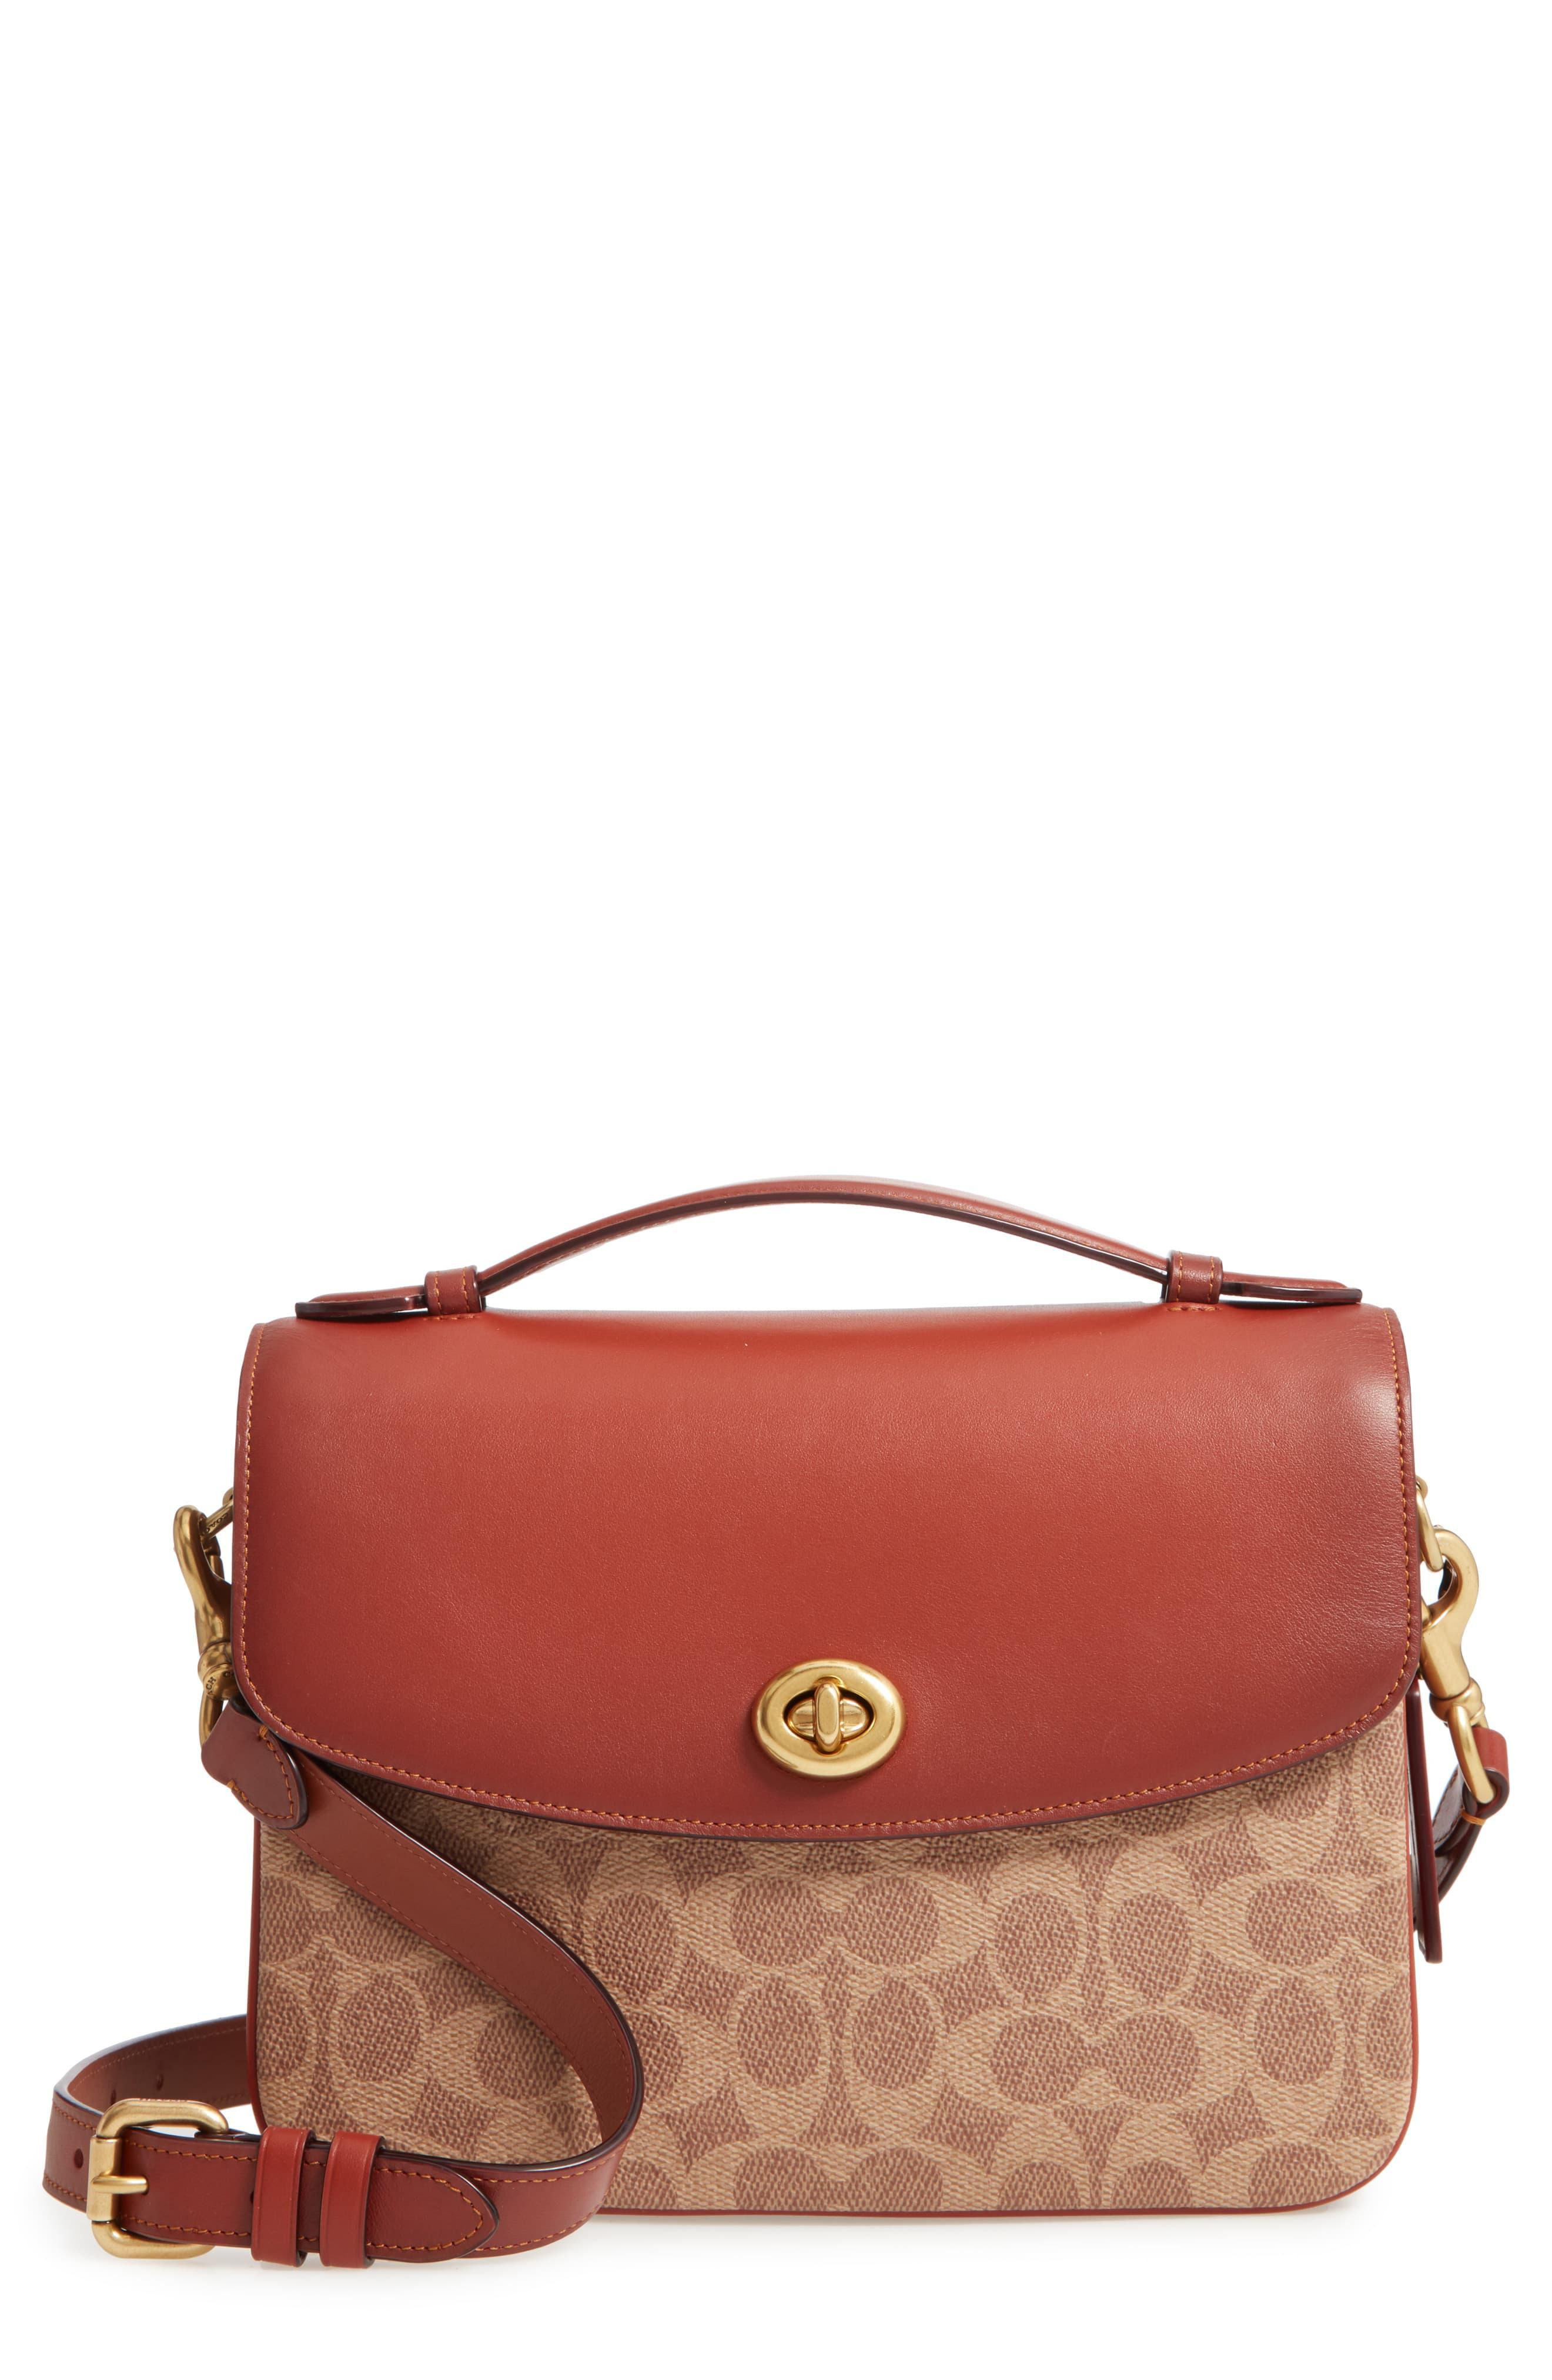 28e848aa COACH Chaise Signature Canvas & Leather Crossbody Bag - in ...